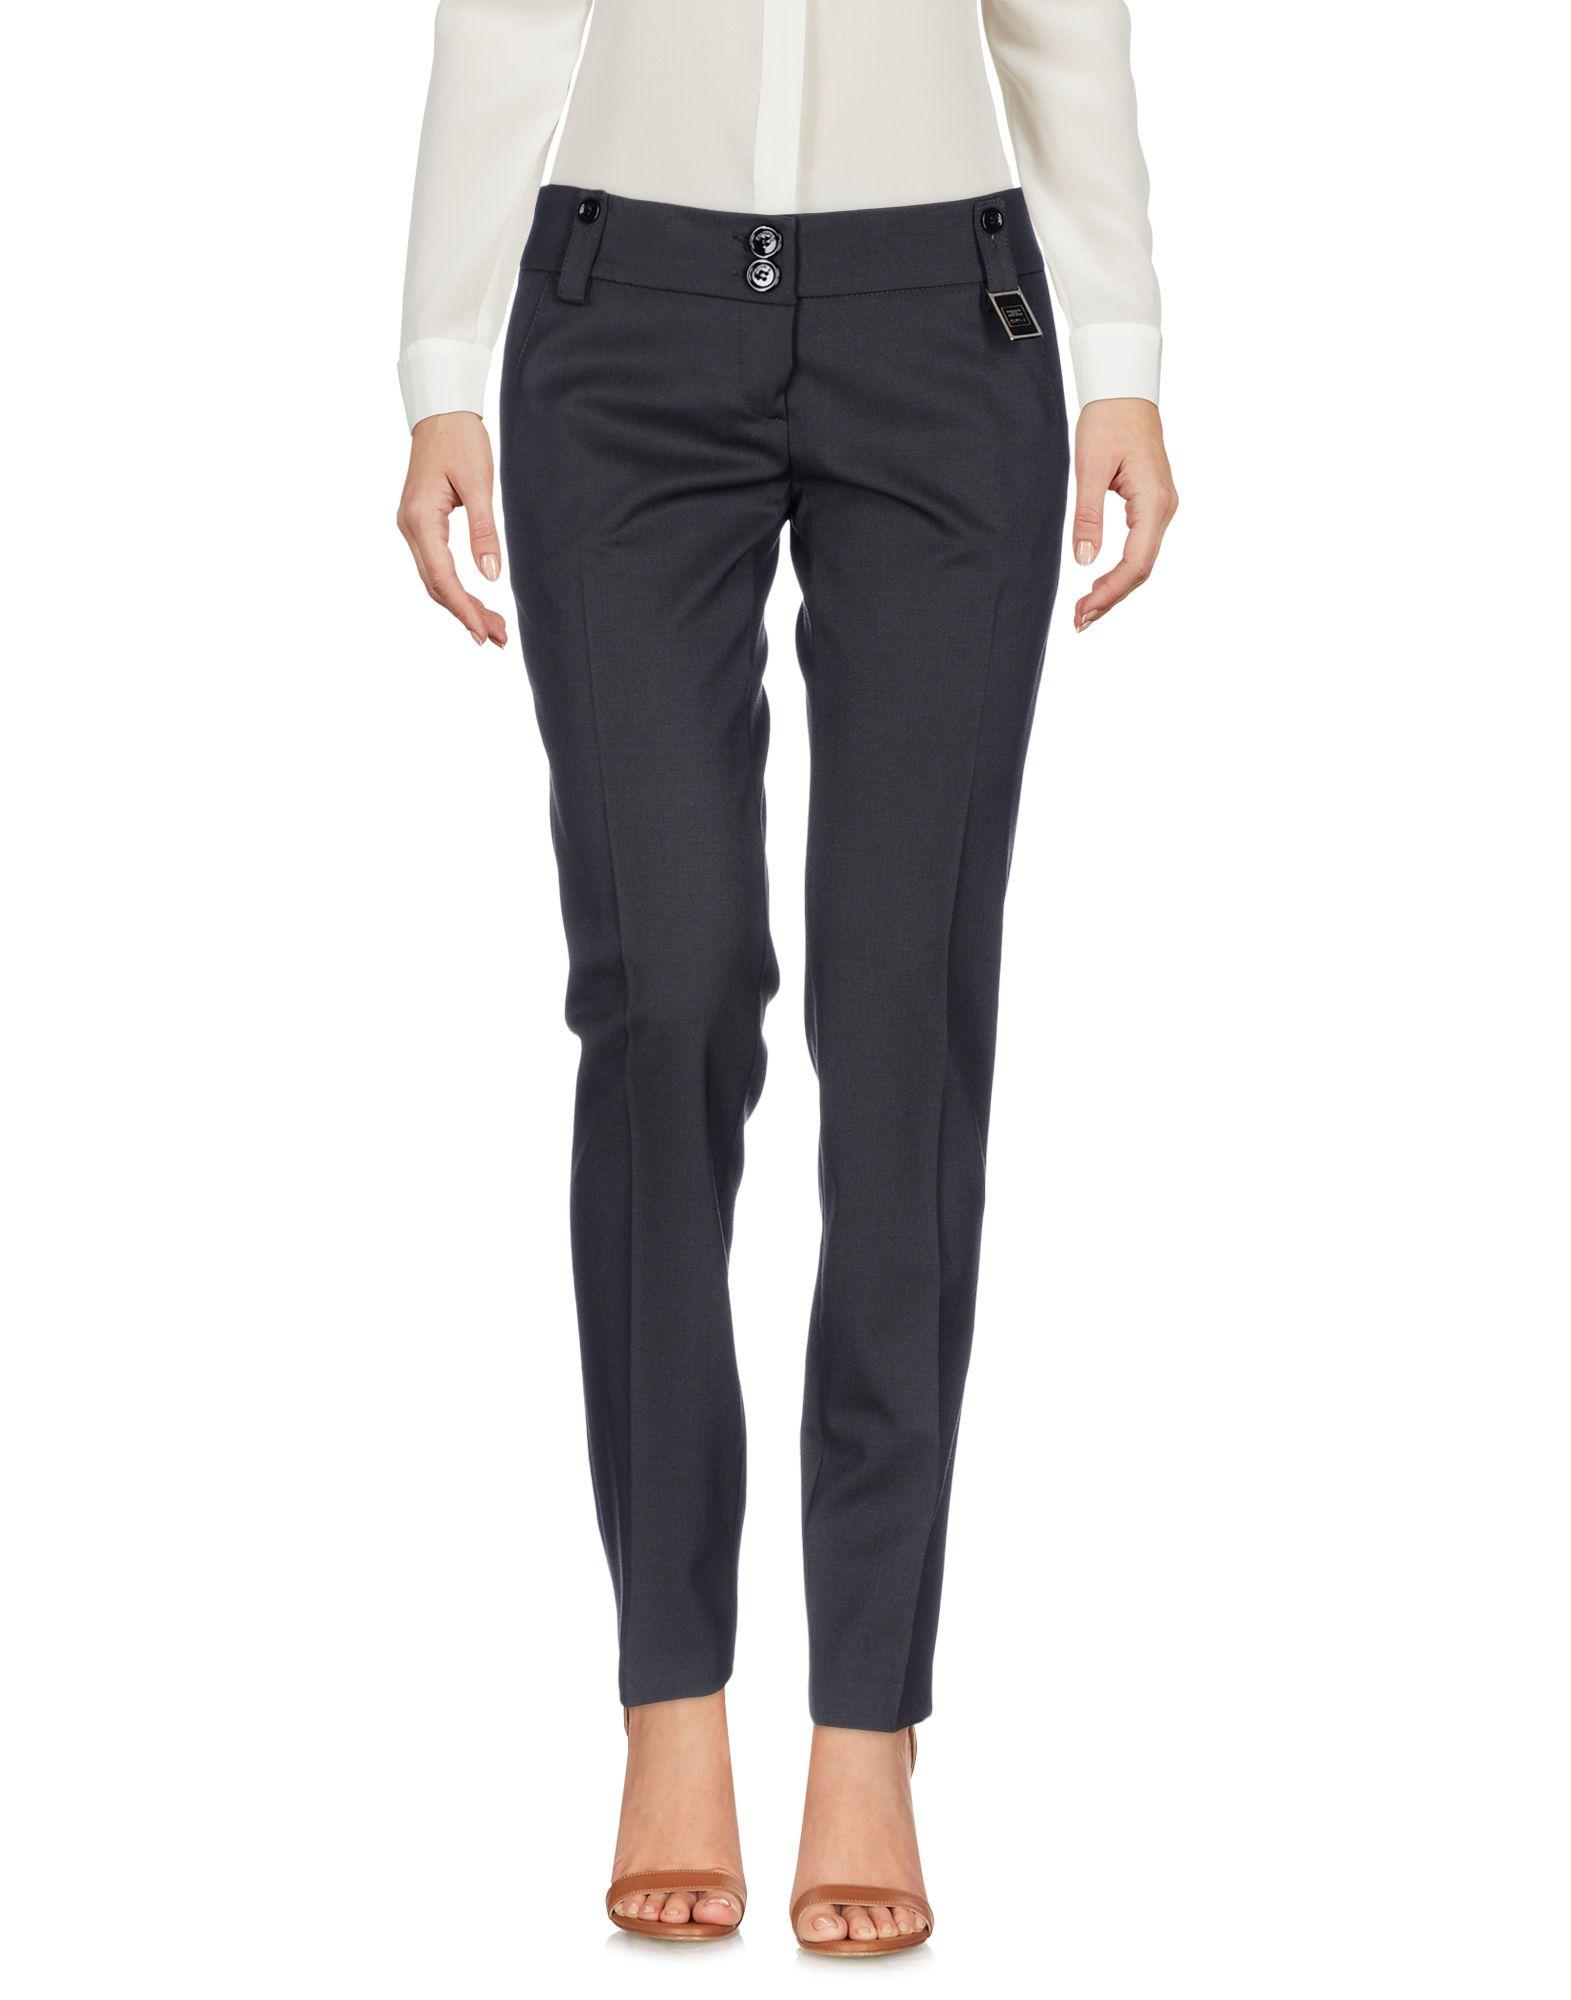 ELISABETTA FRANCHI for CELYN b. Повседневные брюки